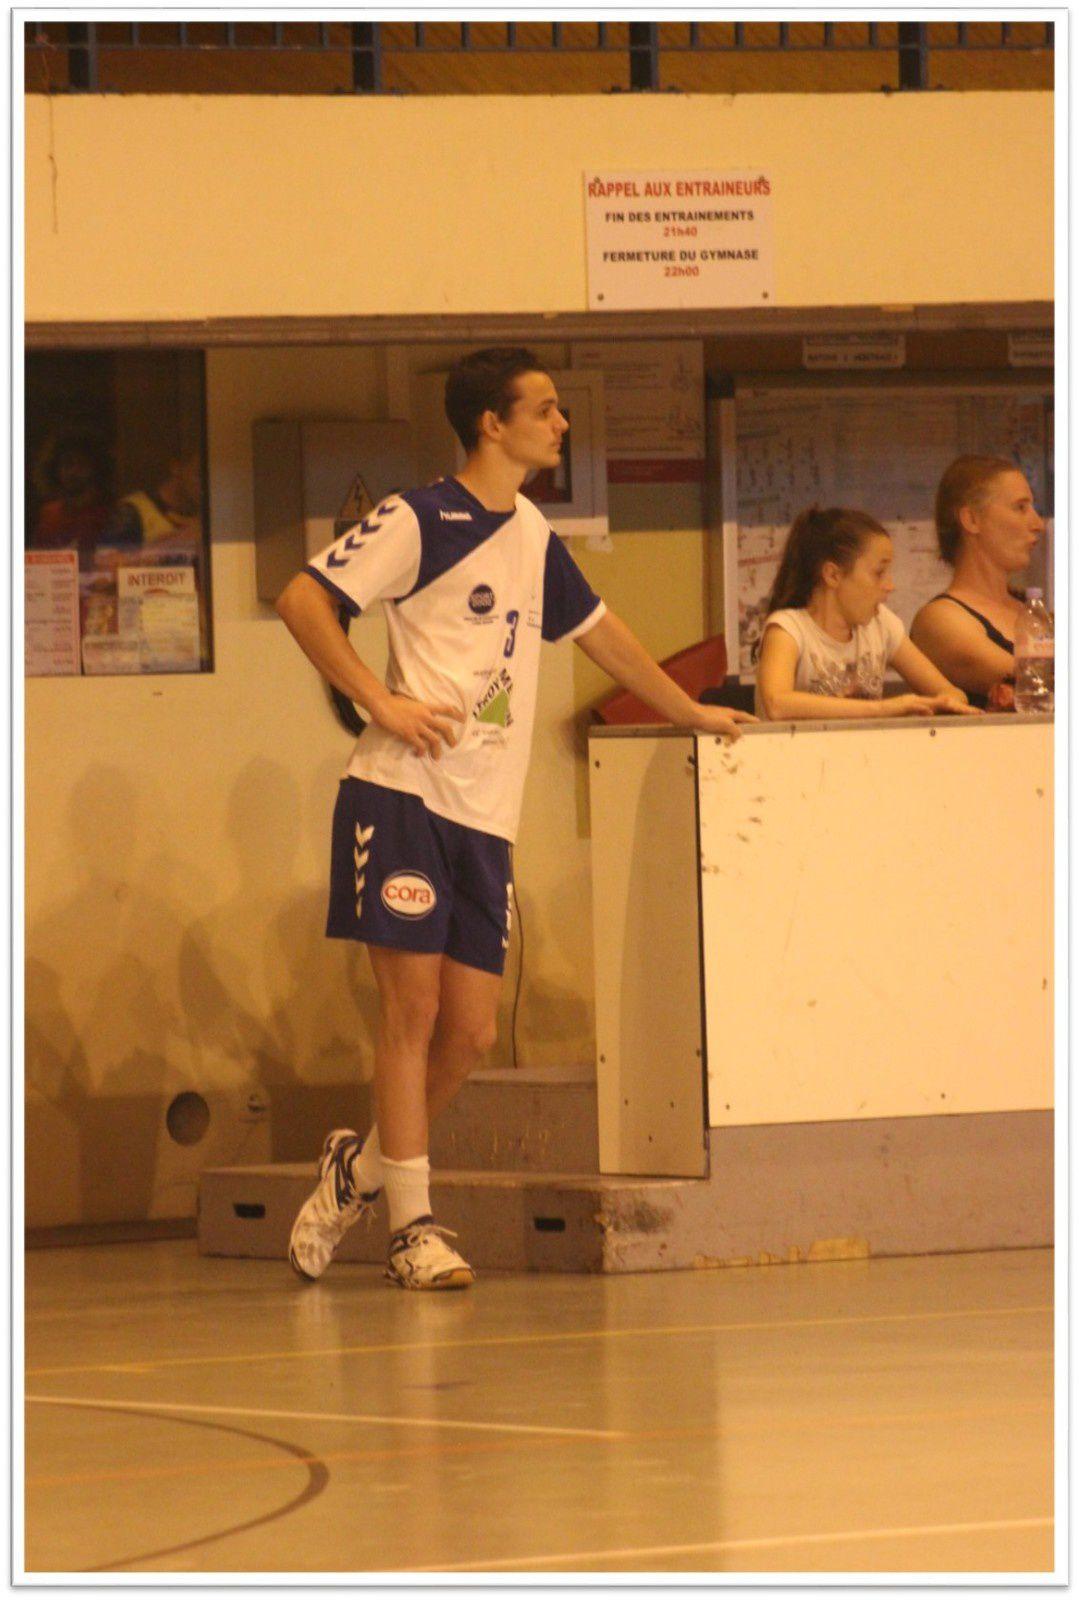 LIVRY-GARGAN vs THBMLV (Match d'entraînement) 10.06.2015